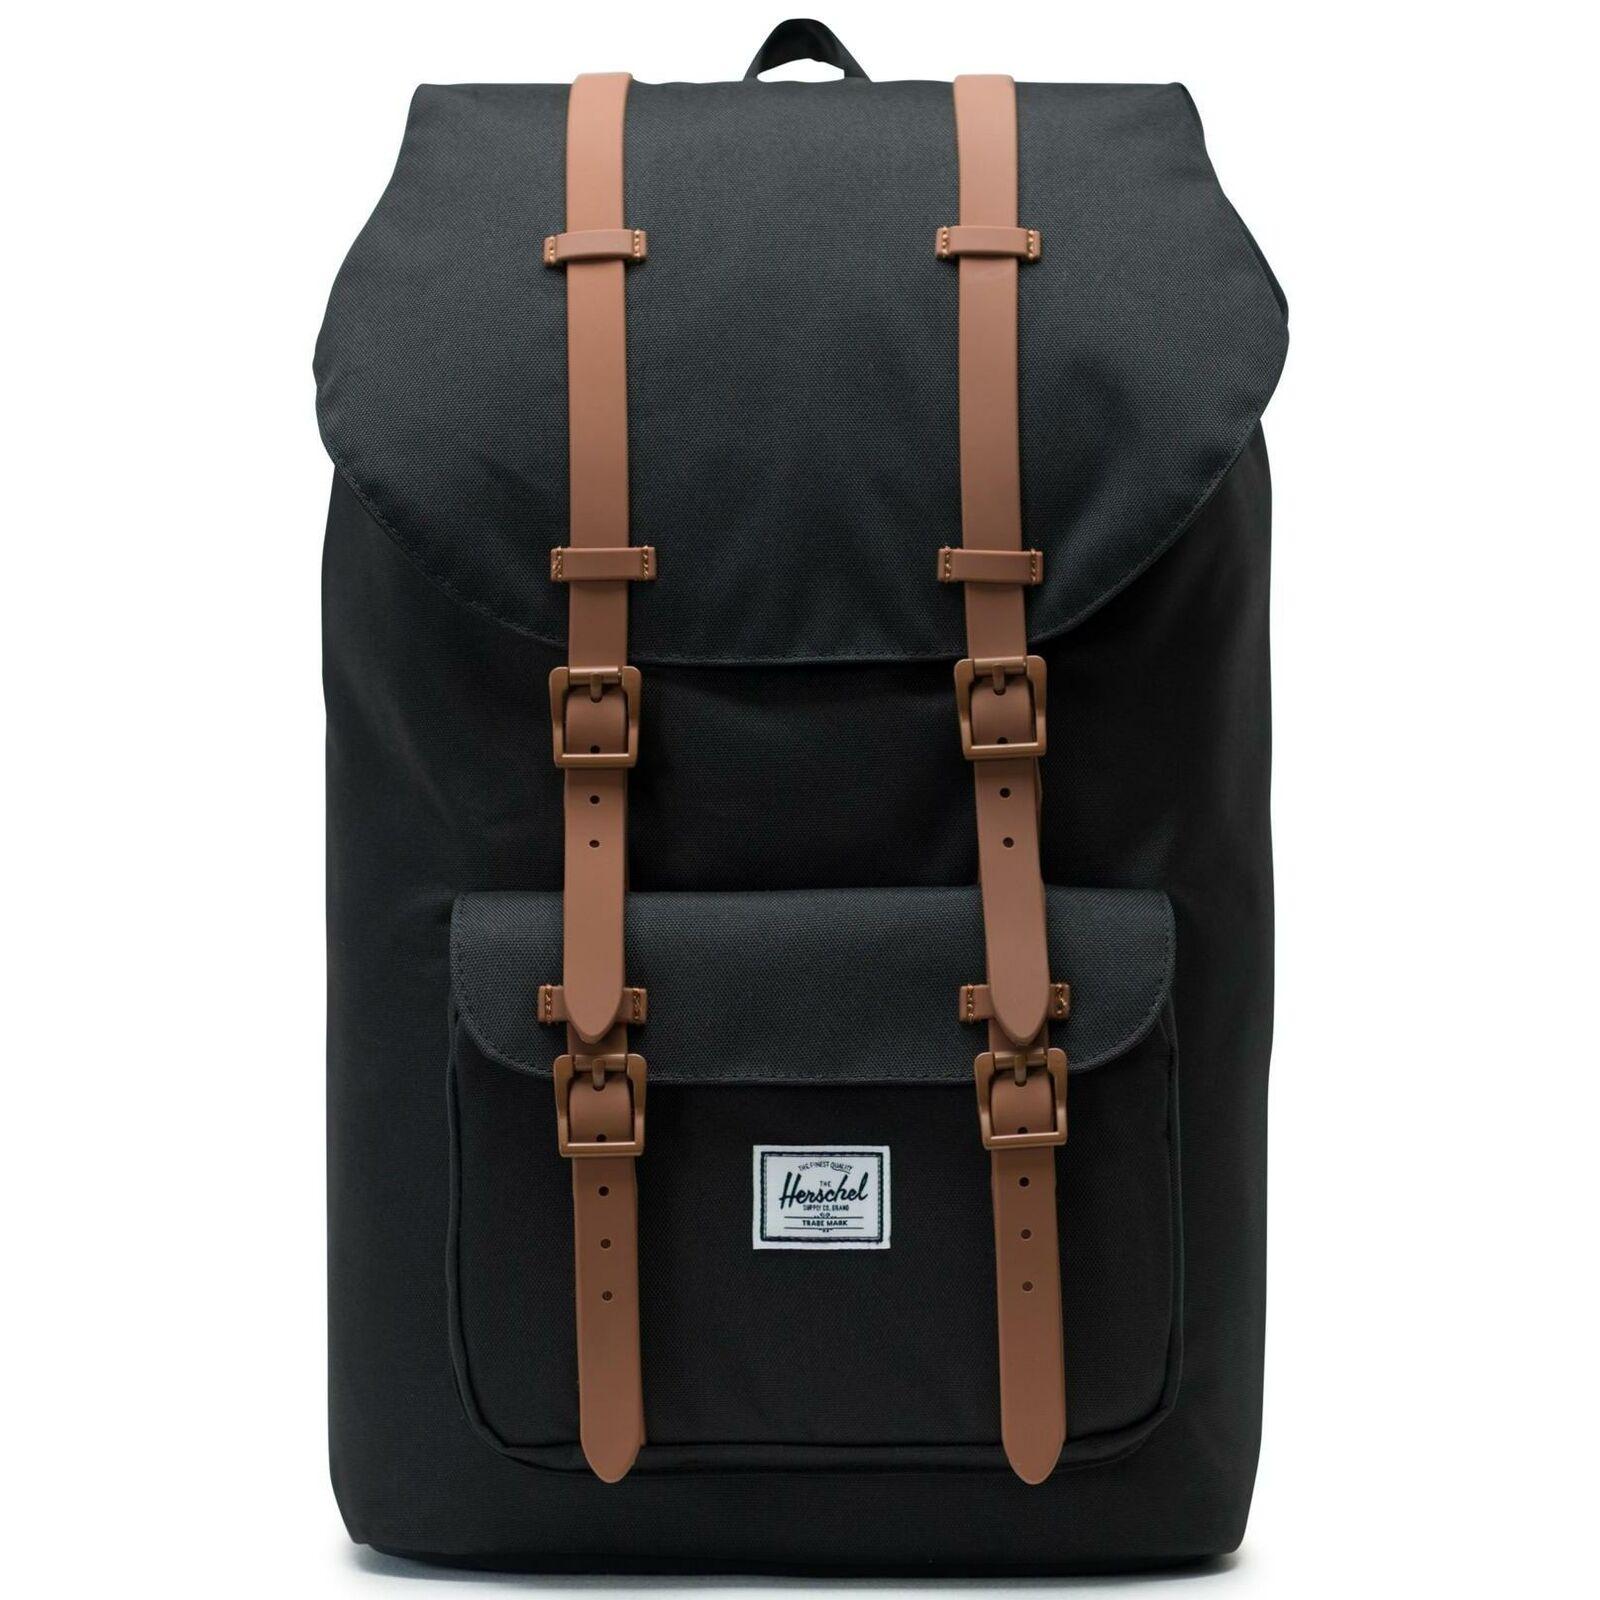 Herschel Little America Backpack Rucksack (Maße: 50 x 29 x 18 cm)